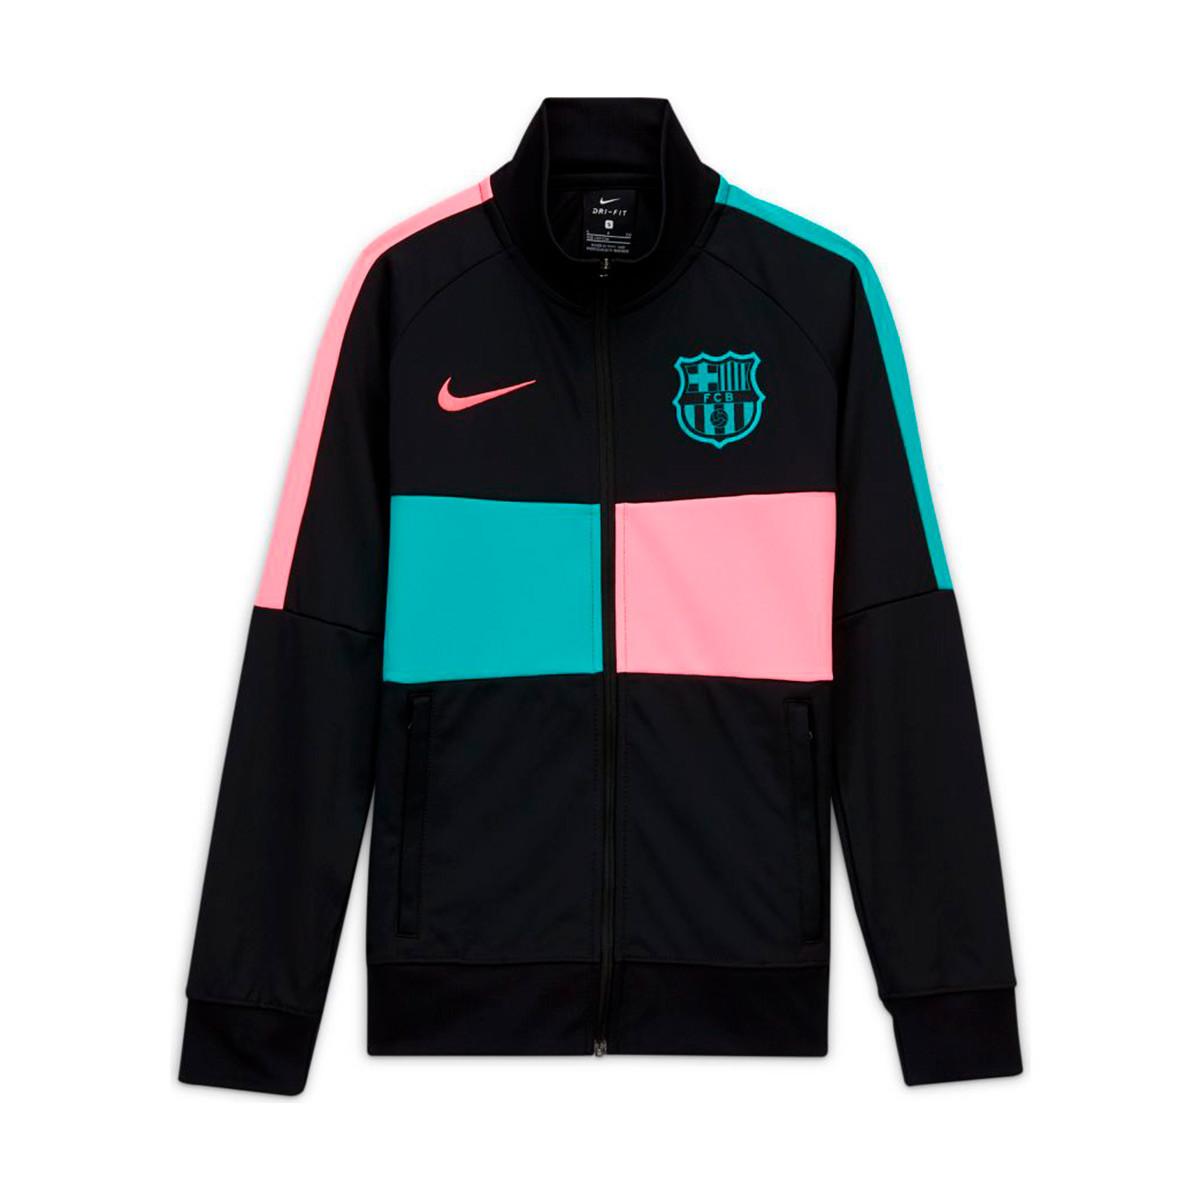 Frugal siesta mosquito  Chamarra Nike FC Barcelona I96 Anthem CL 2020-2021 Niño Black-Pink beam-New  green - Tienda de fútbol Fútbol Emotion